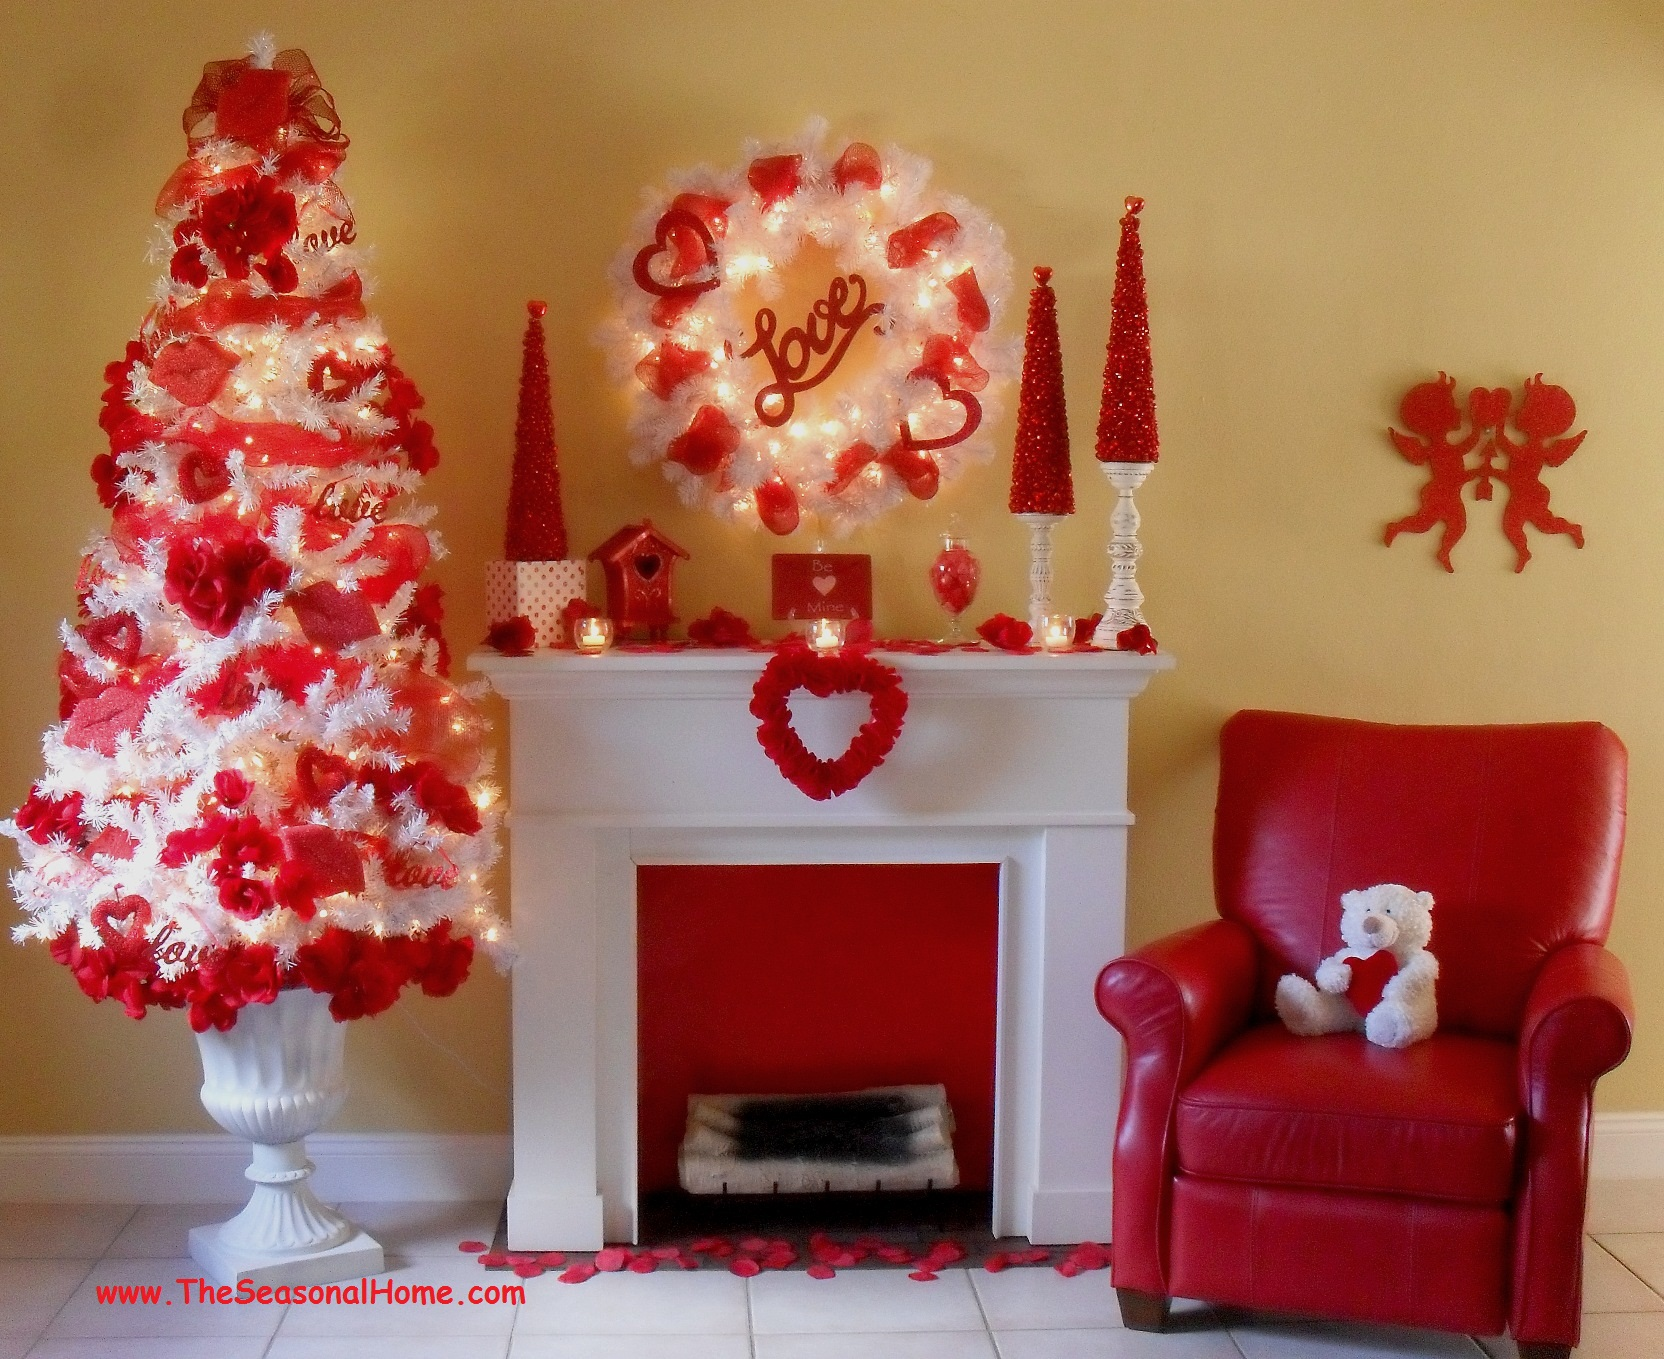 Cute Valentines day home decorating idea & Cute Valentines day home decorating idea | Dmards